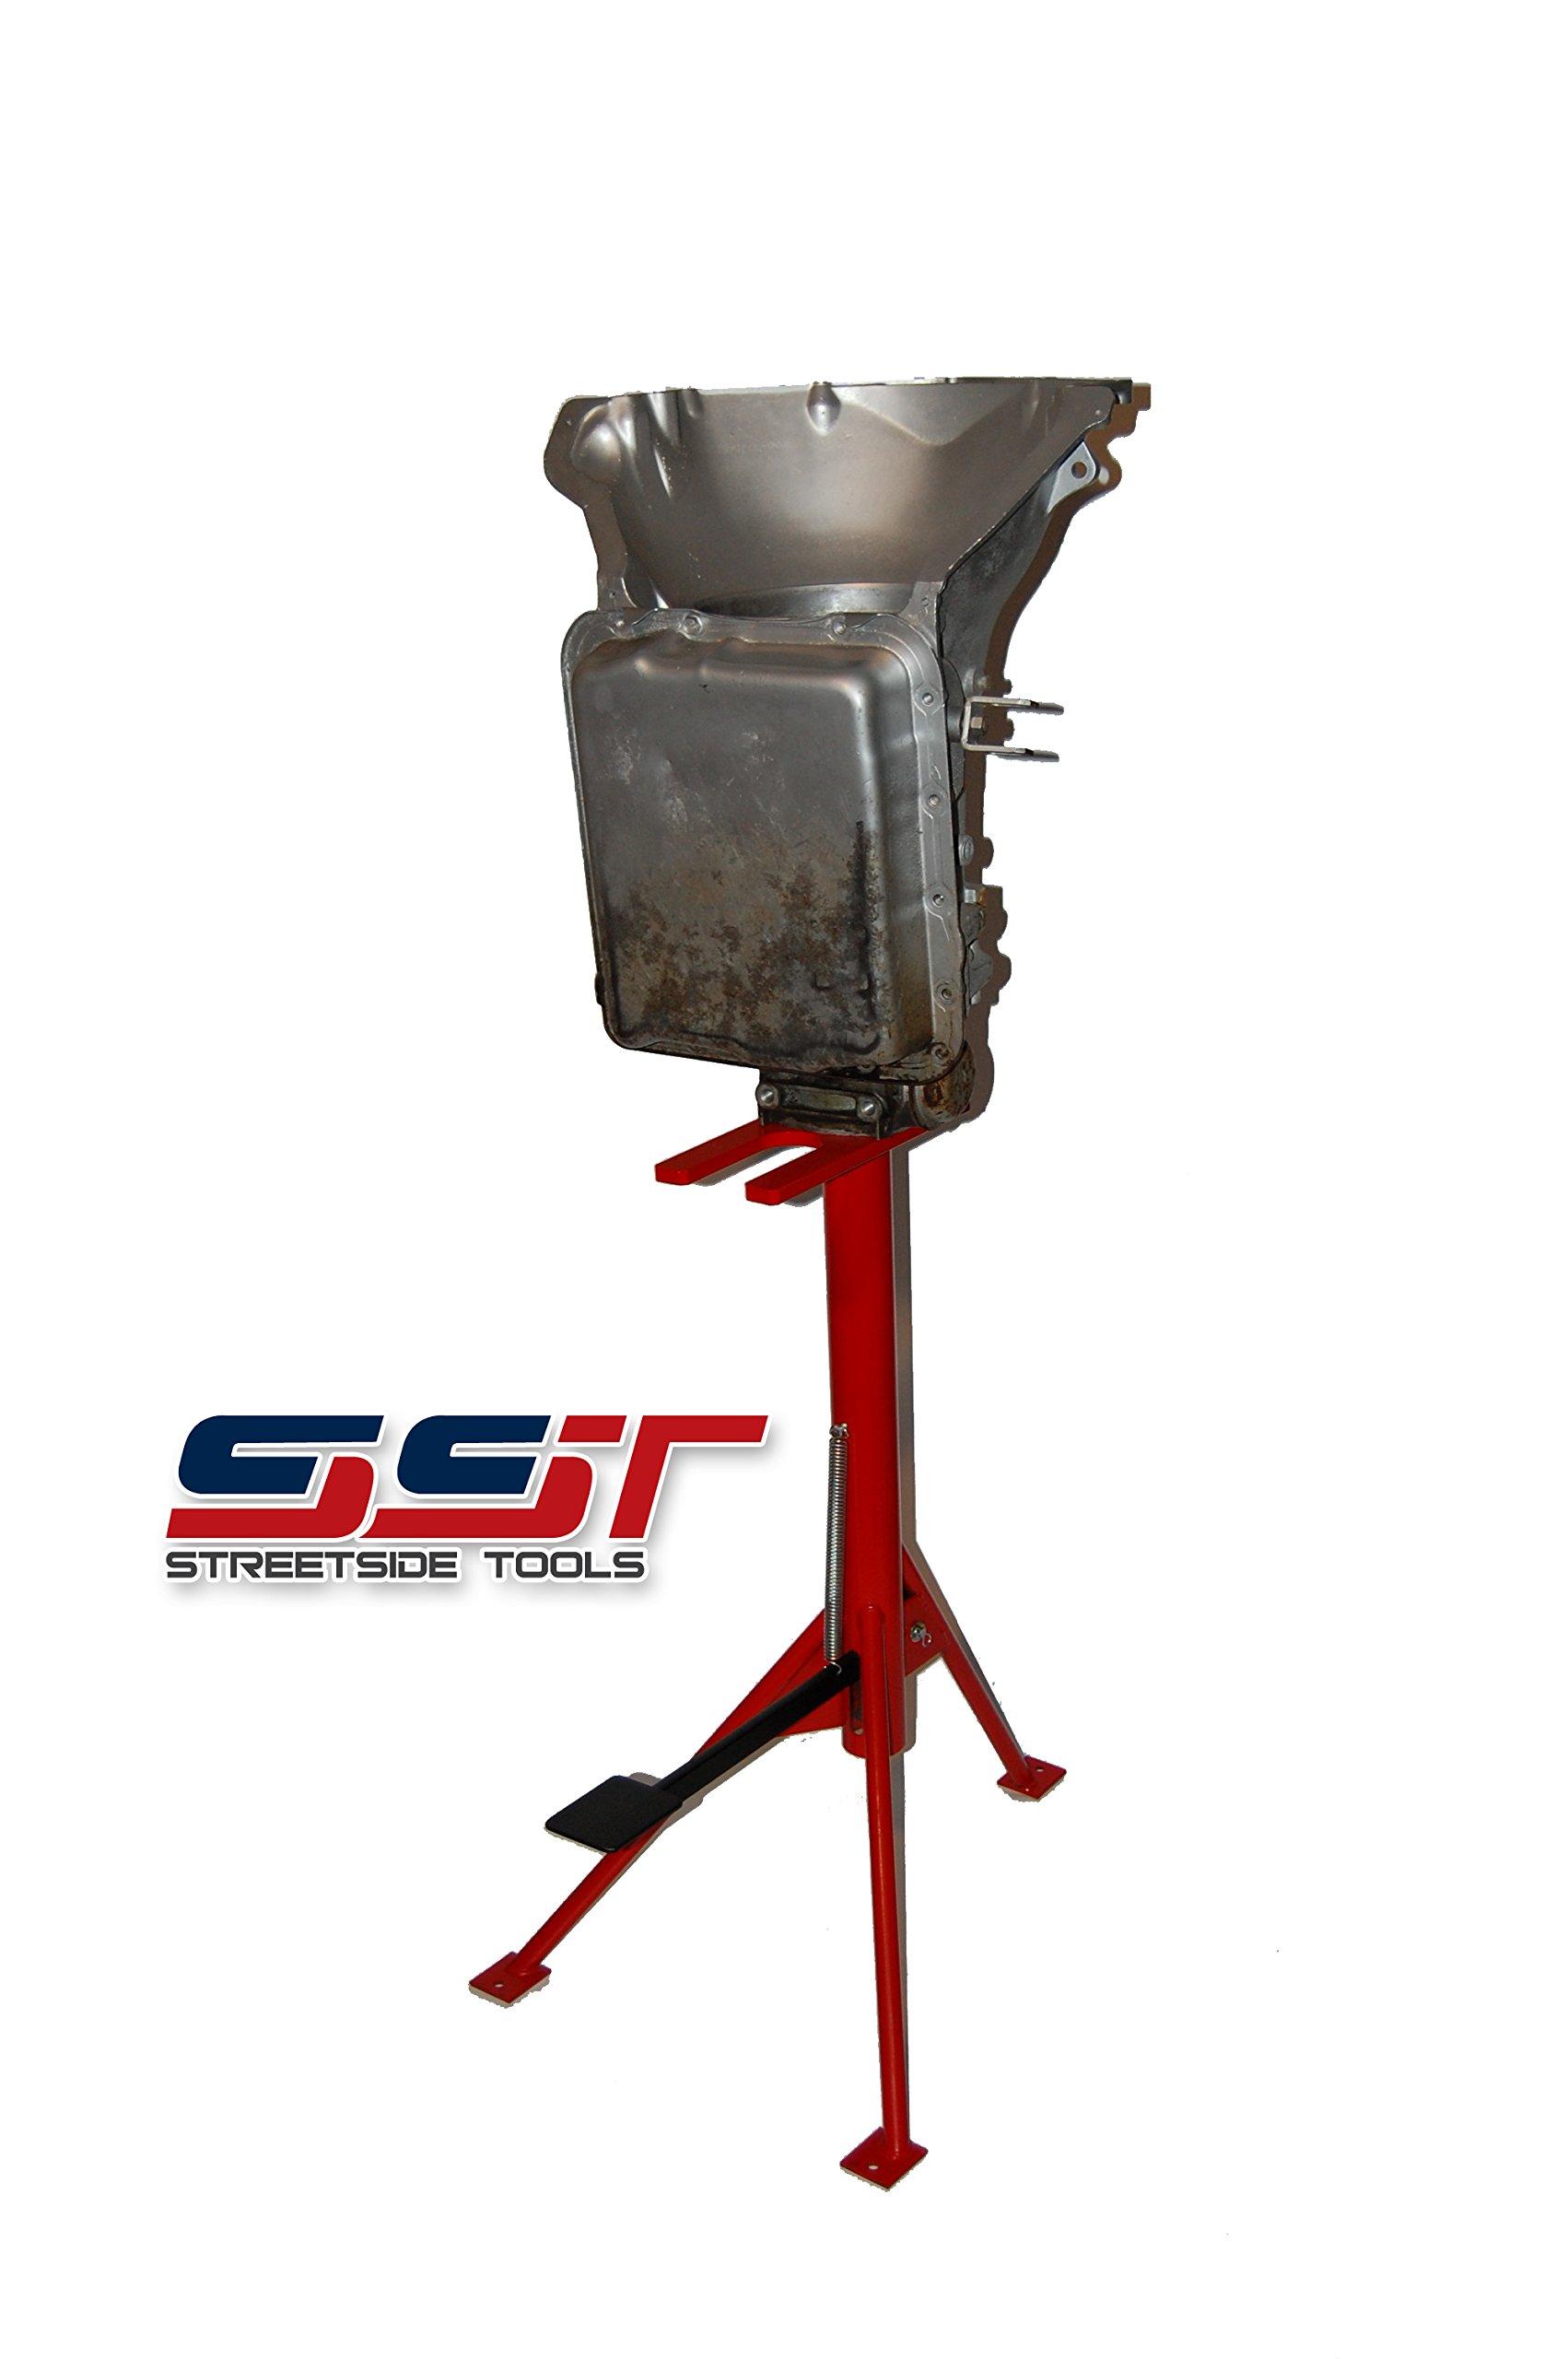 GM SST-0150 Powerglide ALGP Rear Clutch Spring Compressor Transmission Tool